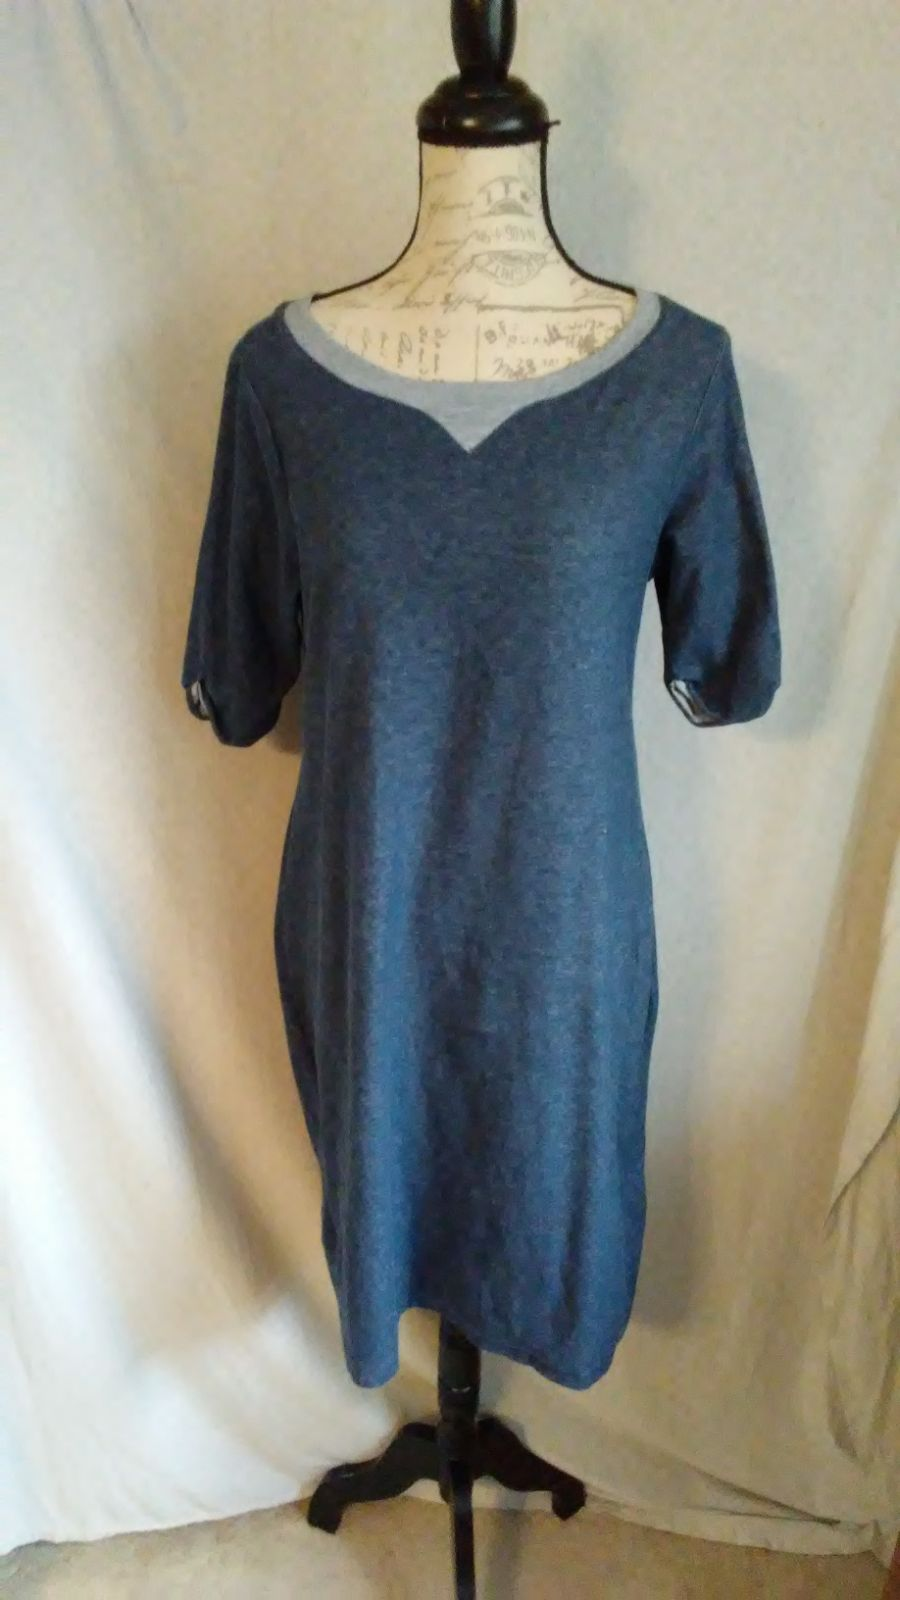 Liz lange dark blue maternity dress l mercari the selling app liz lange dark blue maternity dress l ombrellifo Choice Image